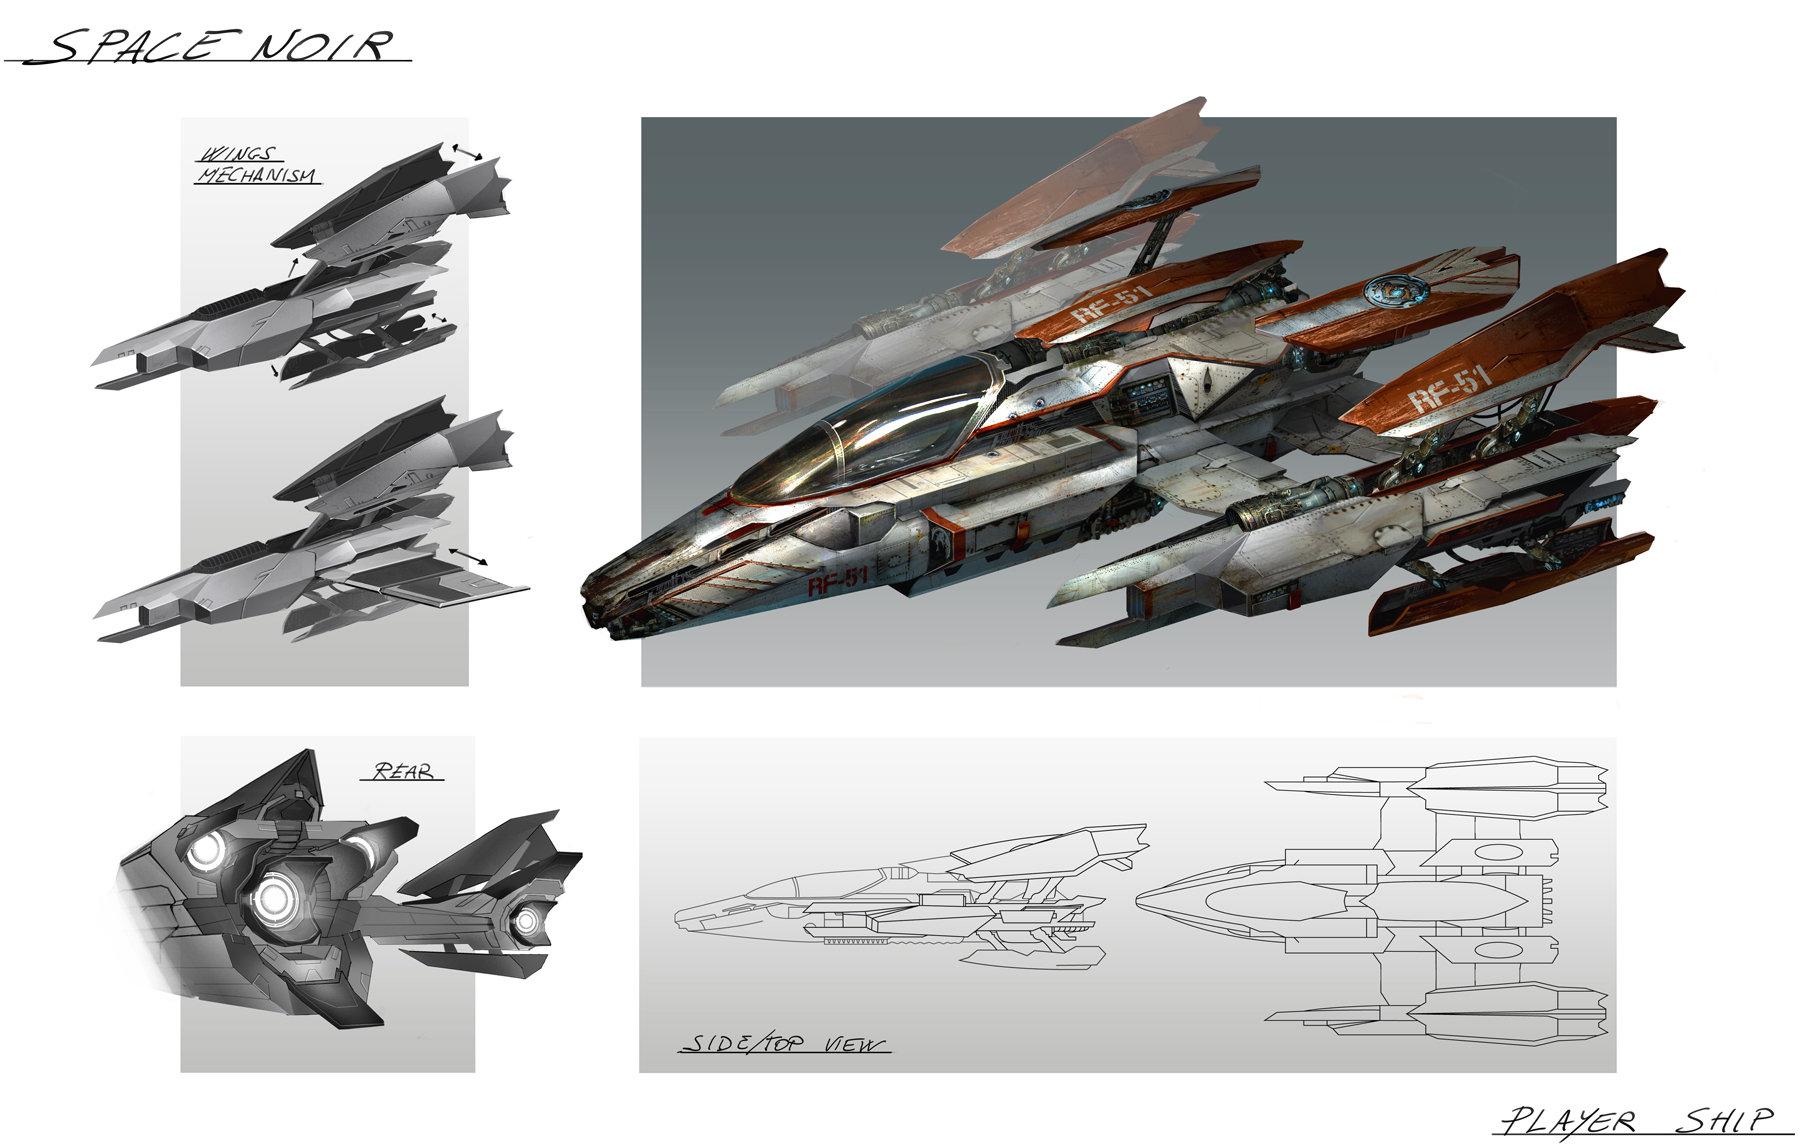 Spacenoir main ship final